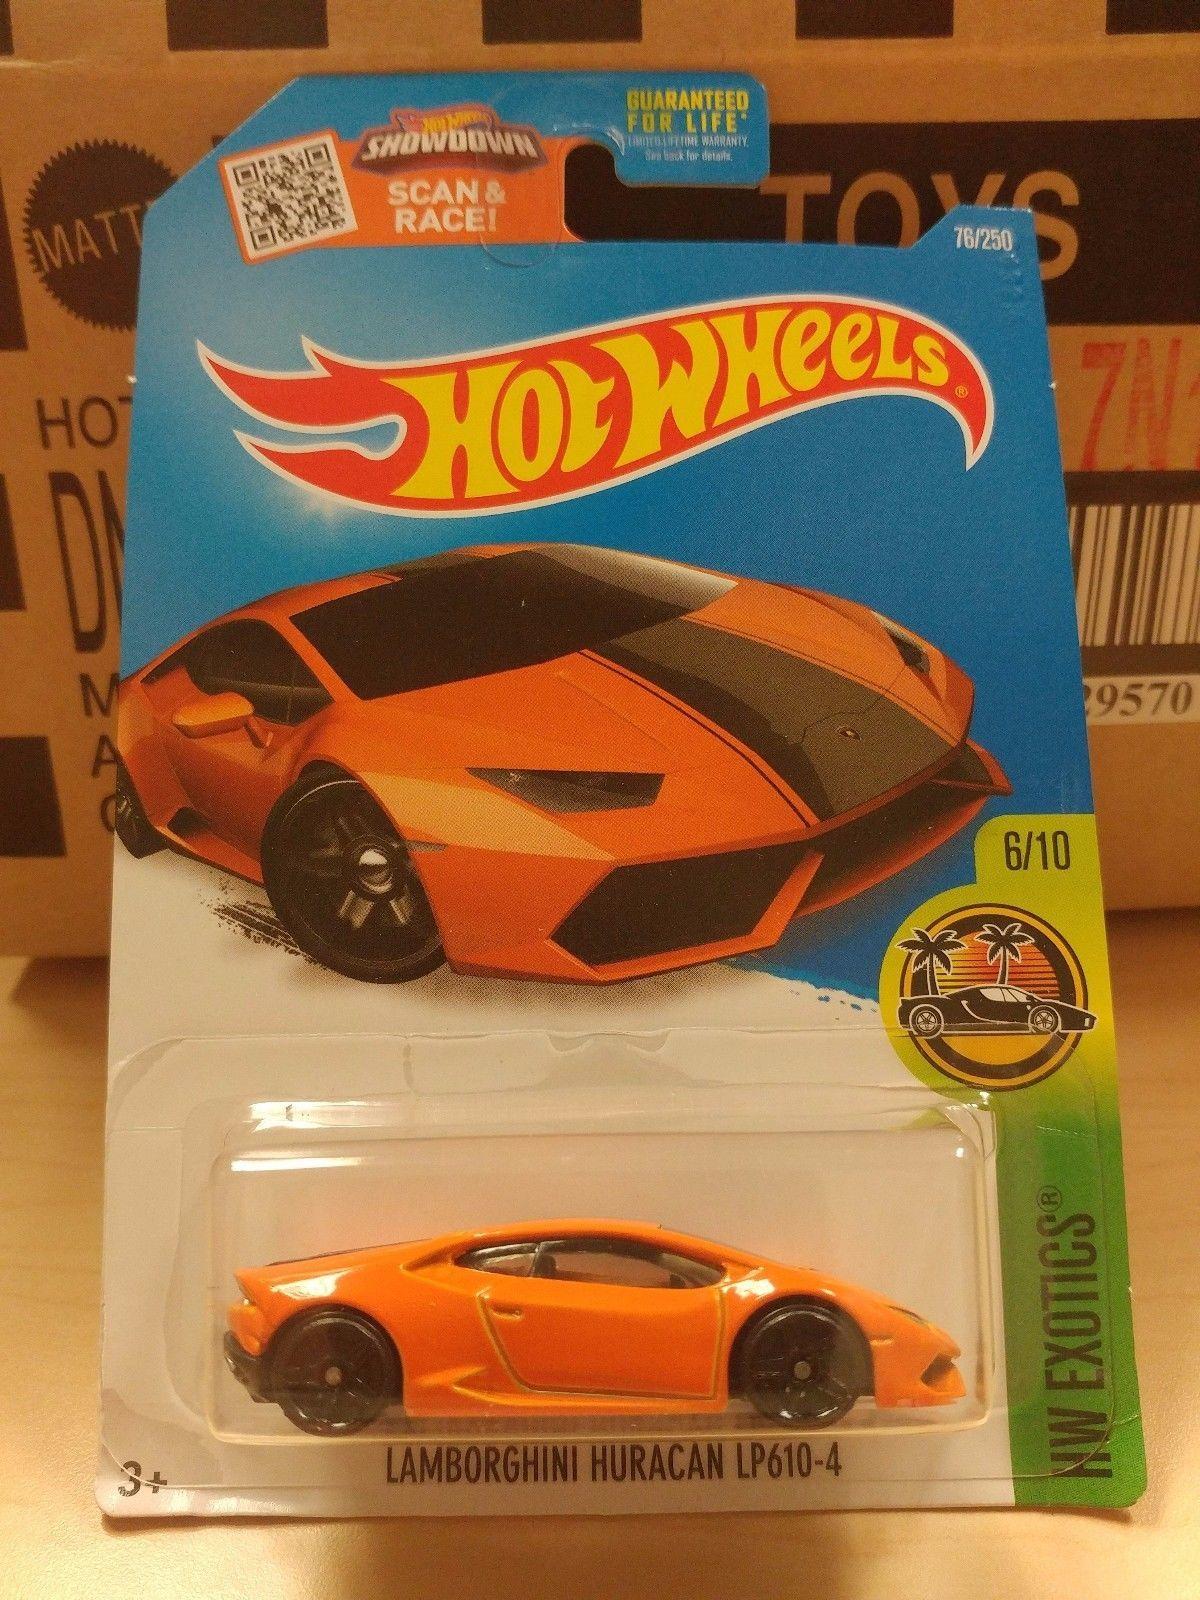 f7d05596a12d5877ce13917dcf3e772a Elegant Bugatti Veyron toy Car Hot Wheels Cars Trend